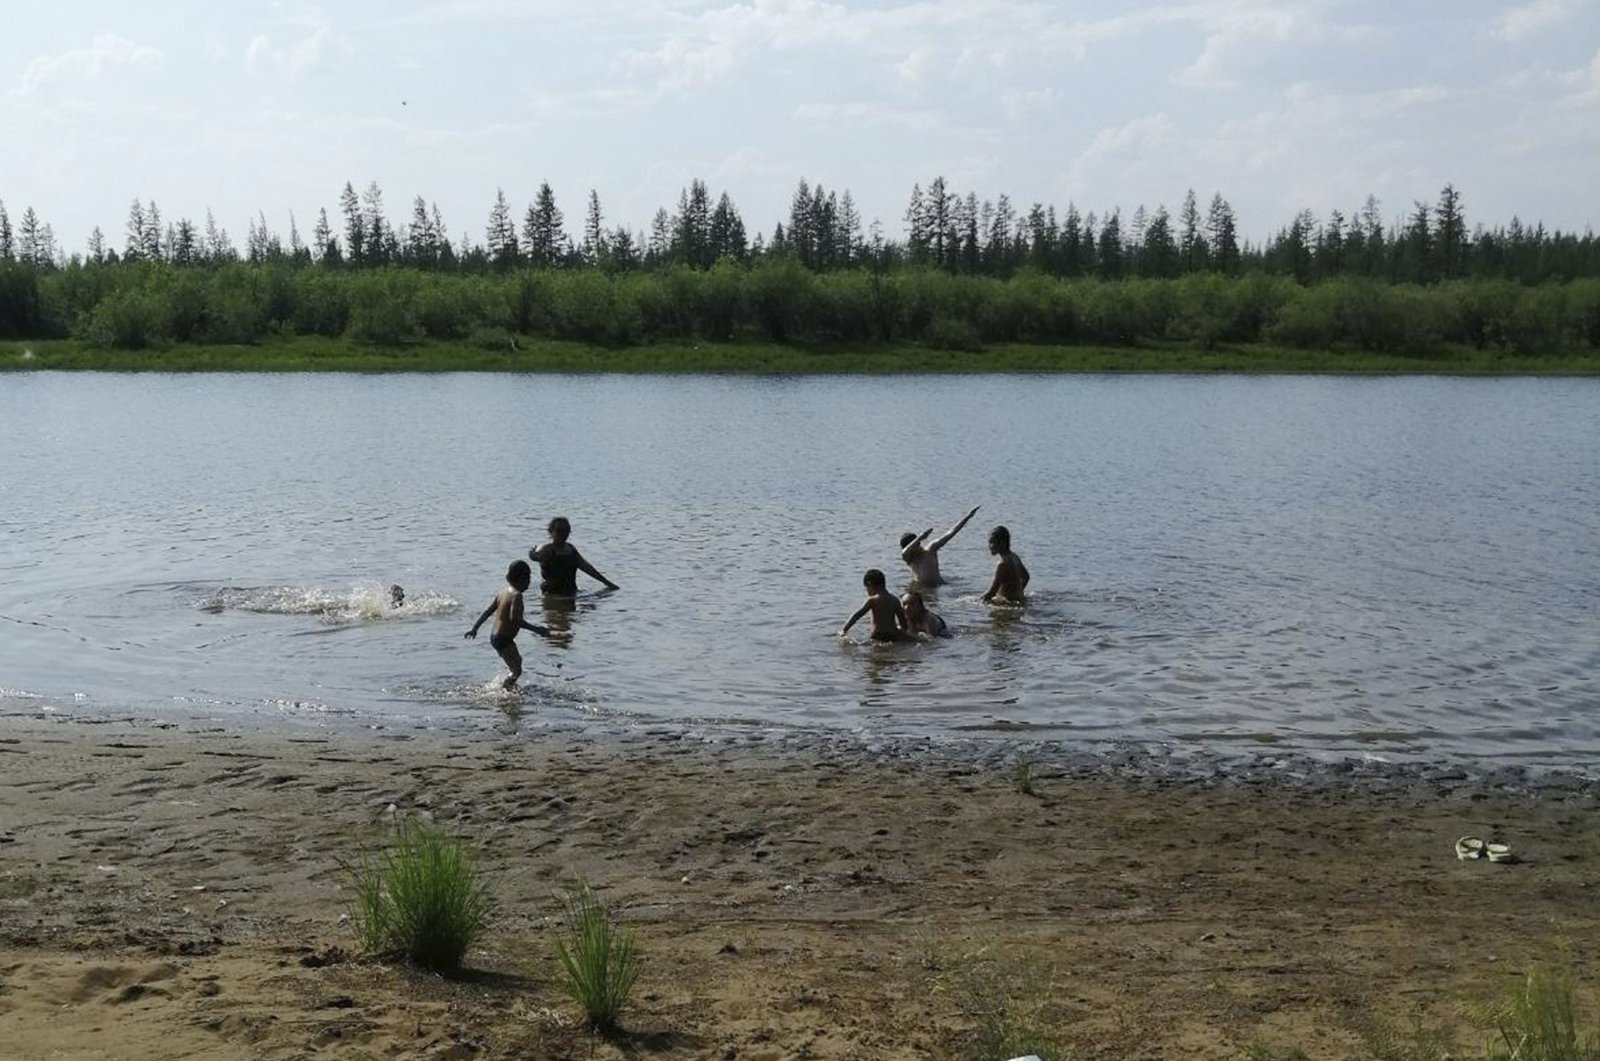 In this handout photo provided by Olga Burtseva, children play in the Krugloe Lake outside Verkhoyansk, the Sakha Republic, Russia, June 21, 2020. (AP Photo)